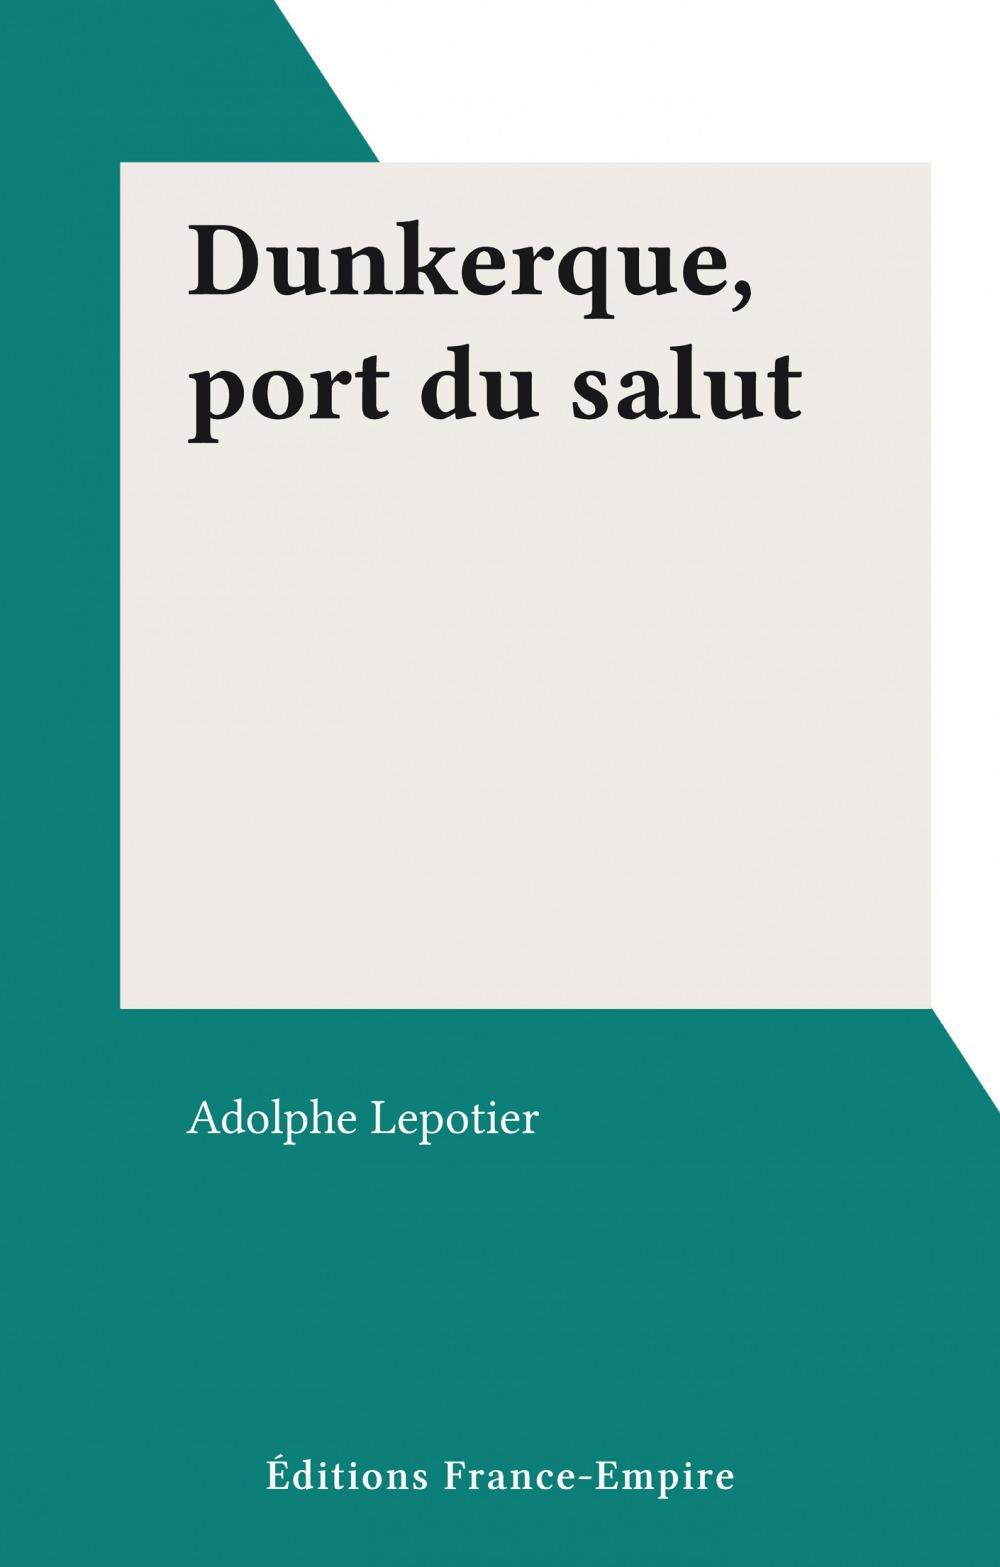 Dunkerque, port du salut